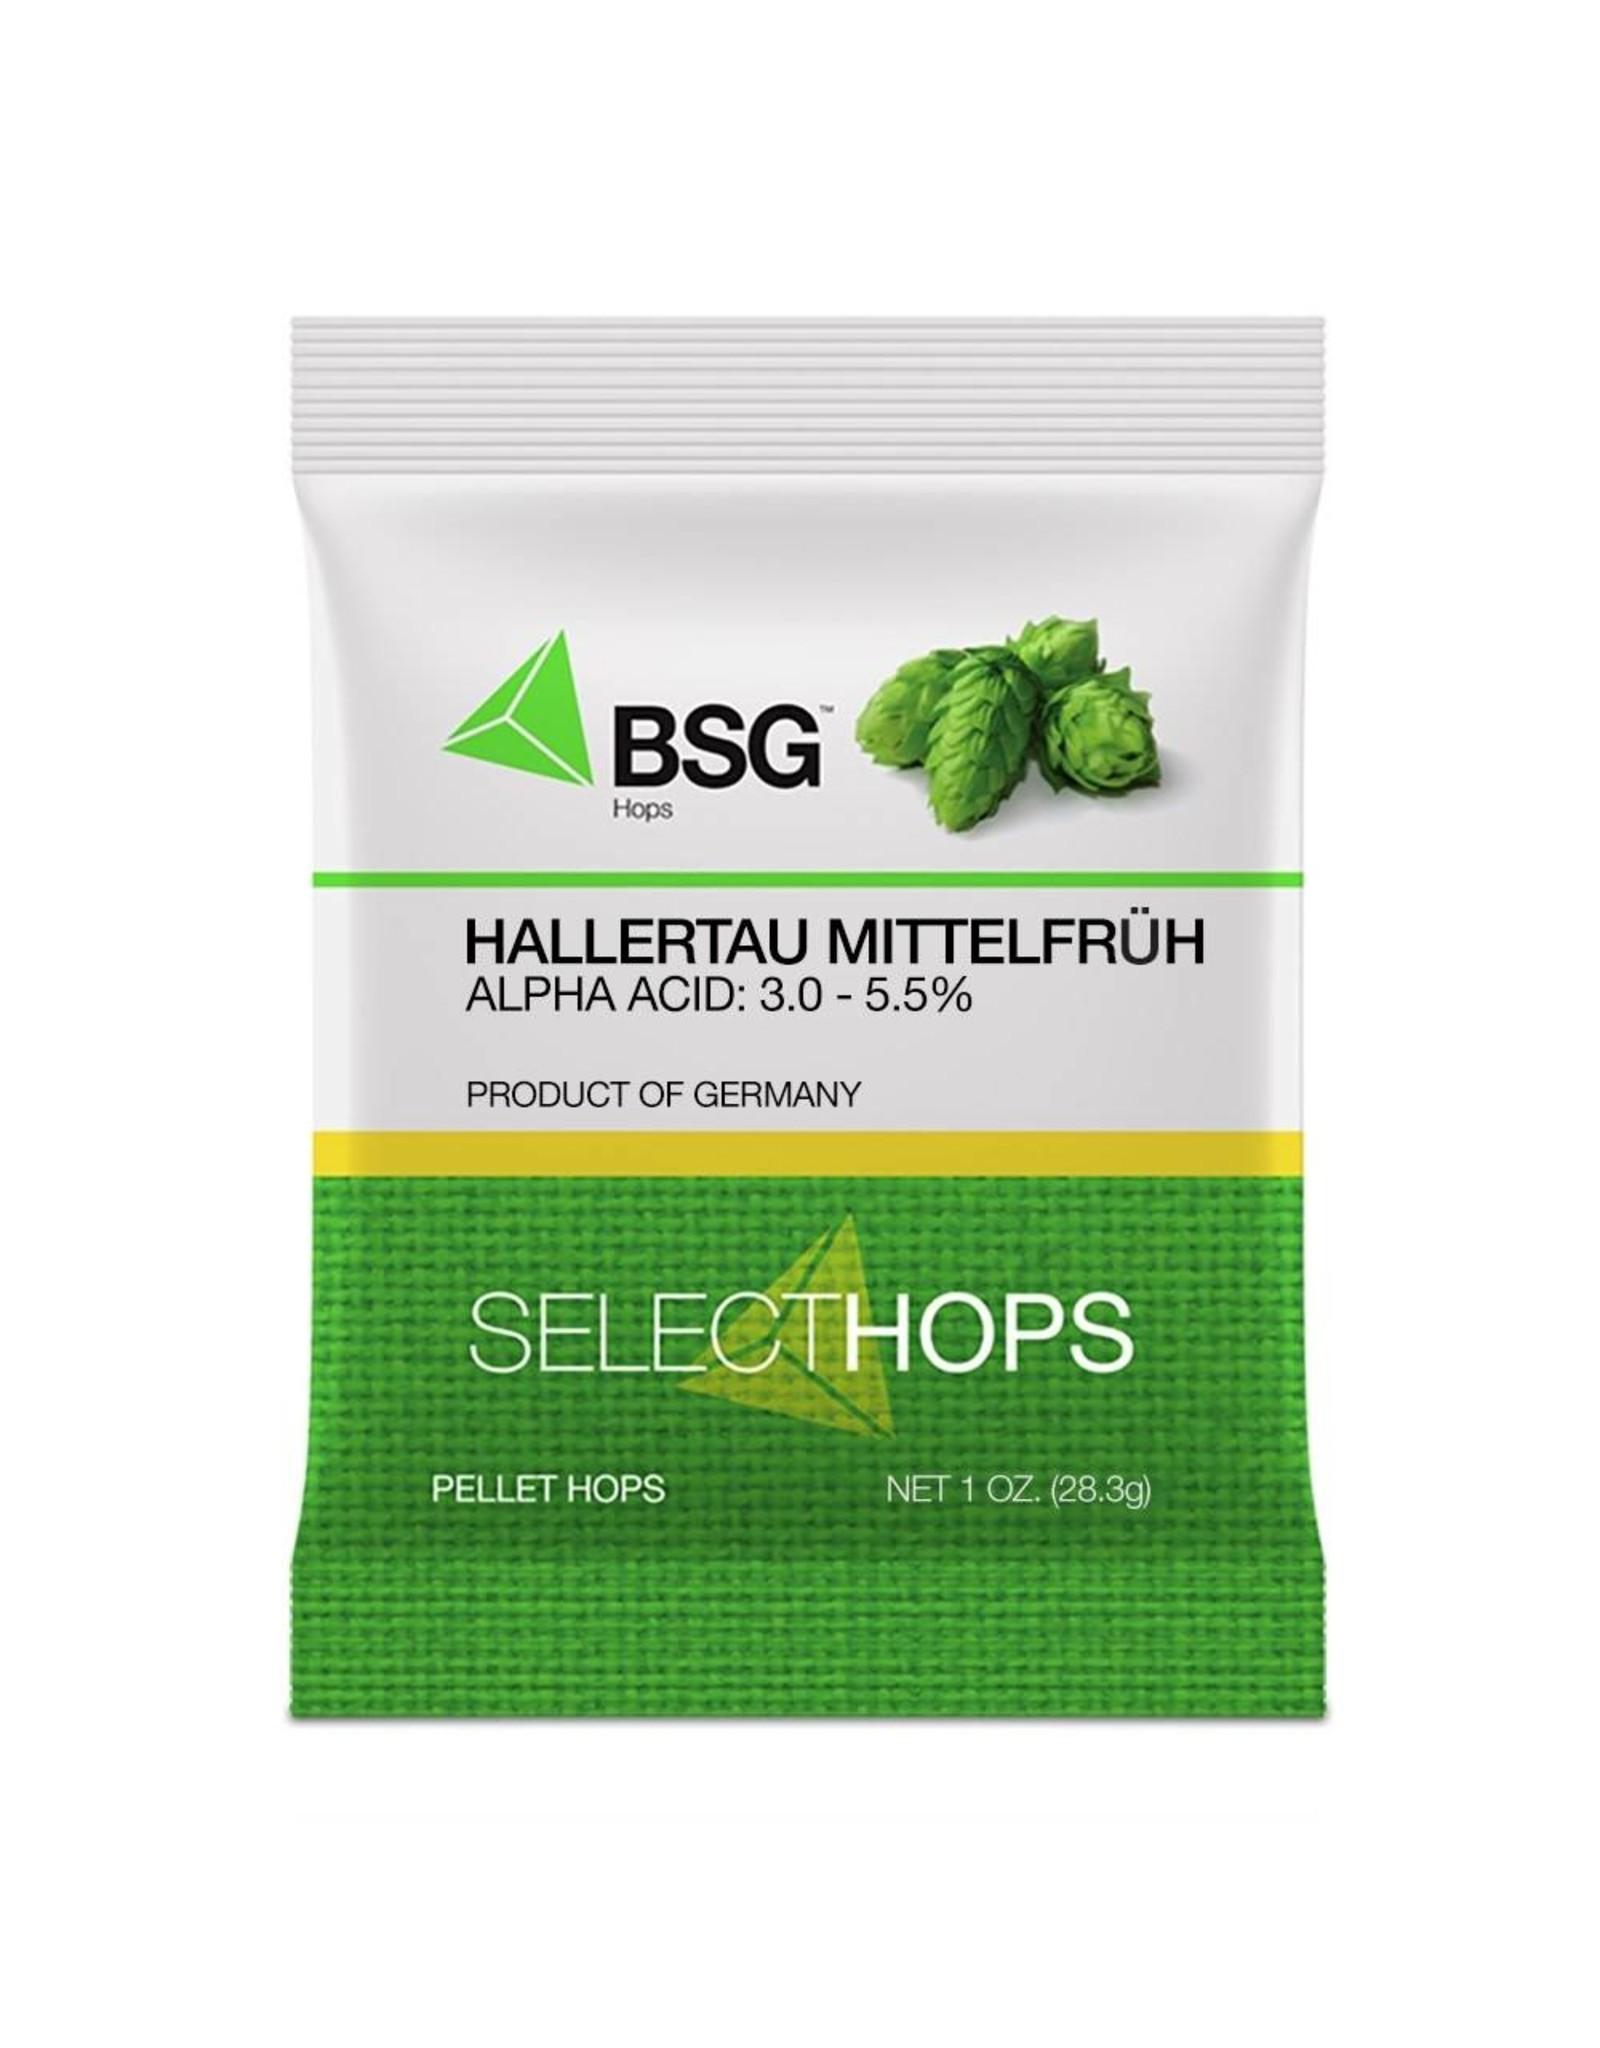 Hallertau Mittelfruh (GR) Pellet Hops 1oz